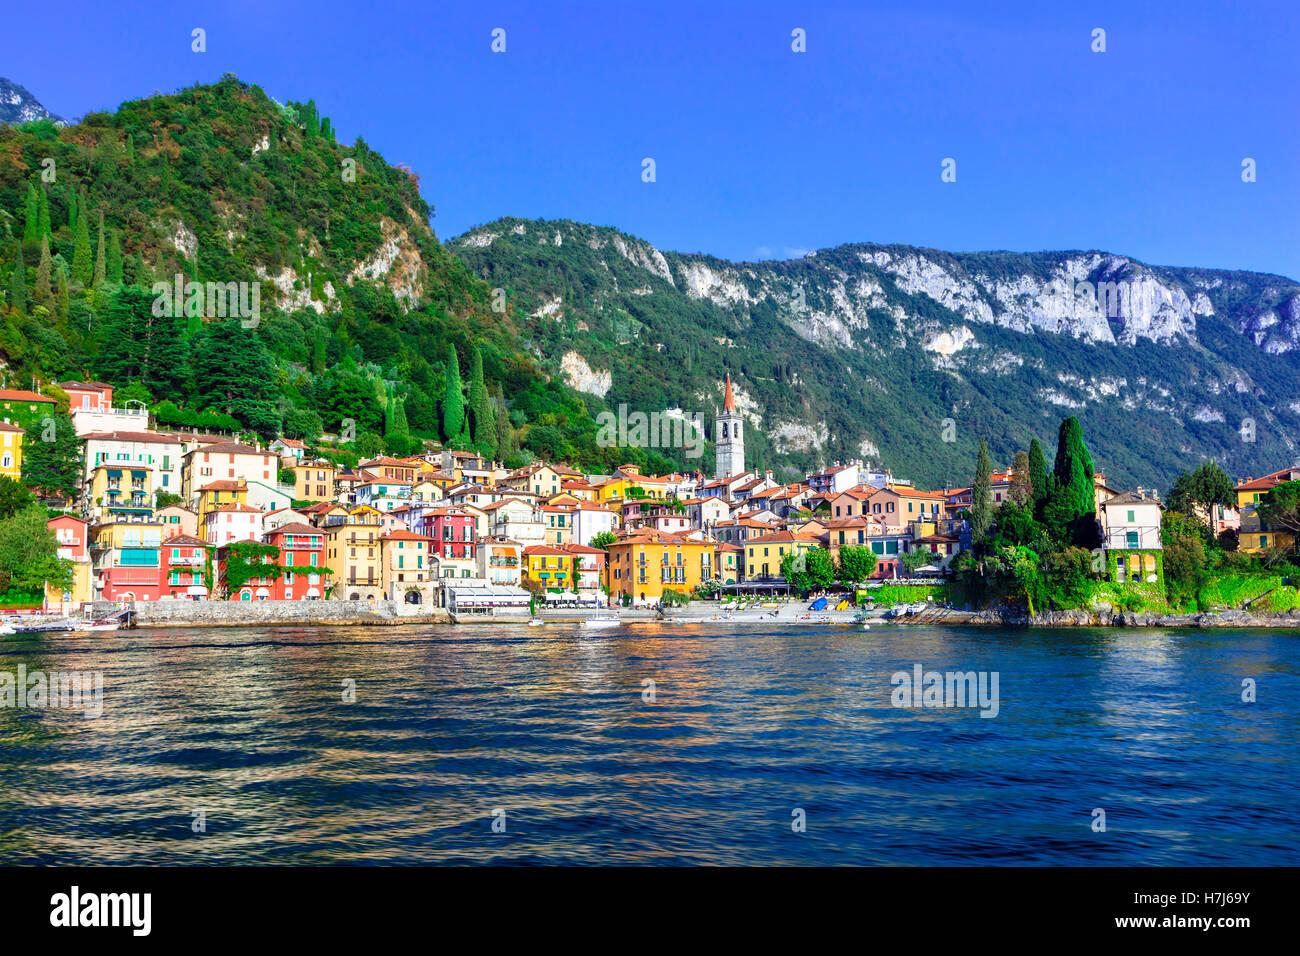 Pictoria scenery of Lago di Como - Varenna village - Stock Image